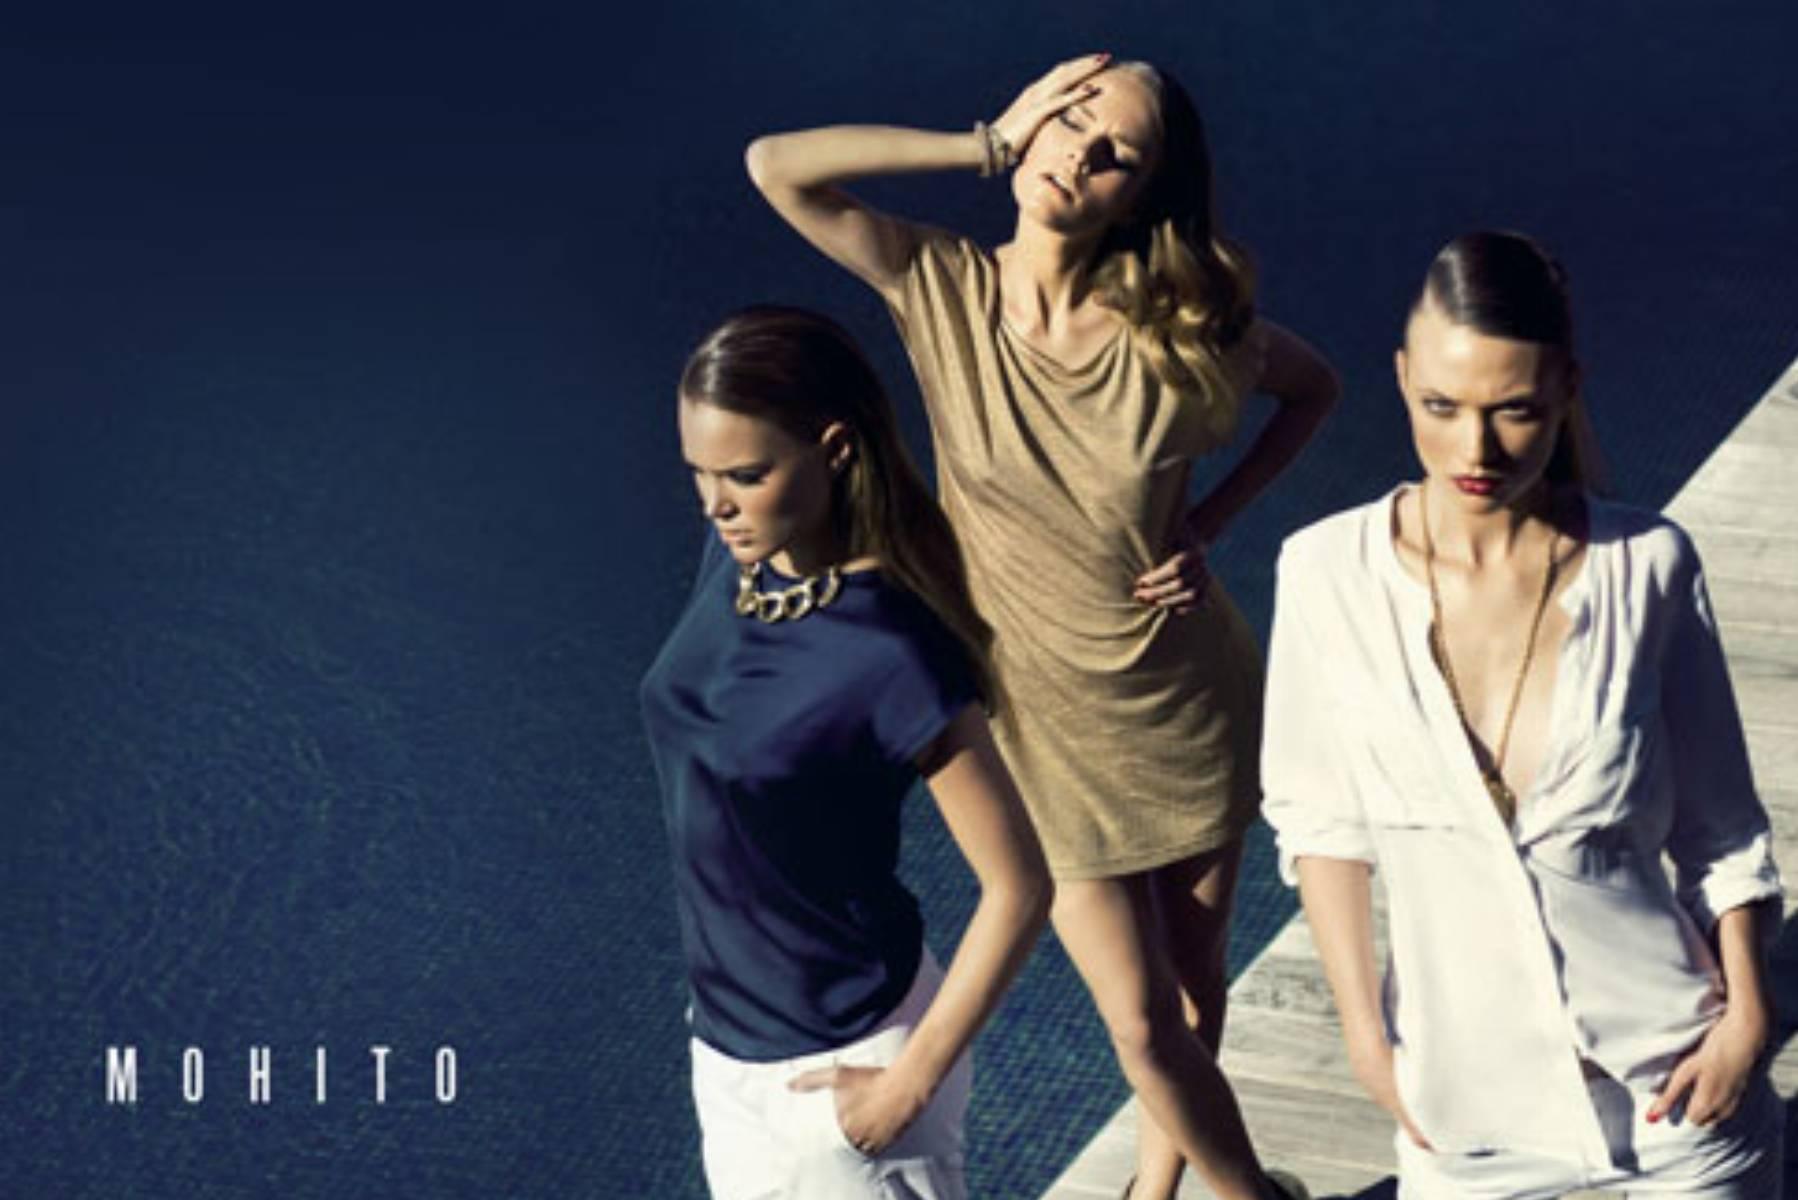 MOHITO - kolekcja Aqua Elegance